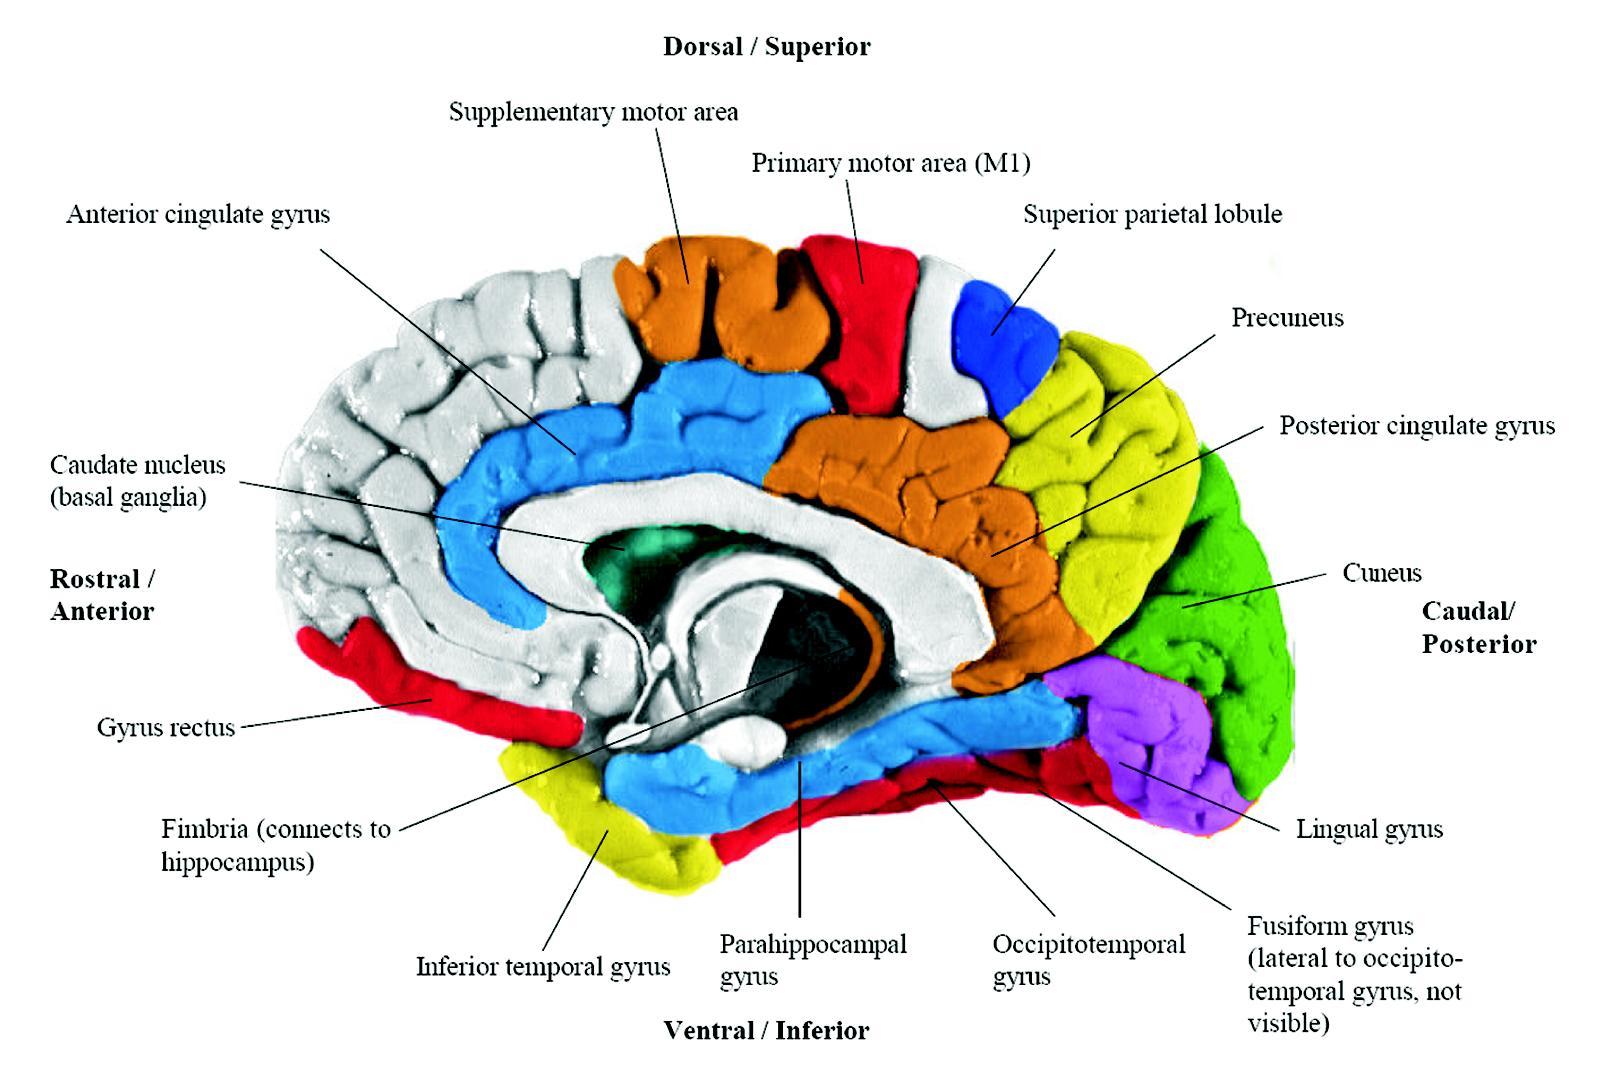 ImageQuiz: Brain Anatomy for CMU 85-429 (Pt. 1)